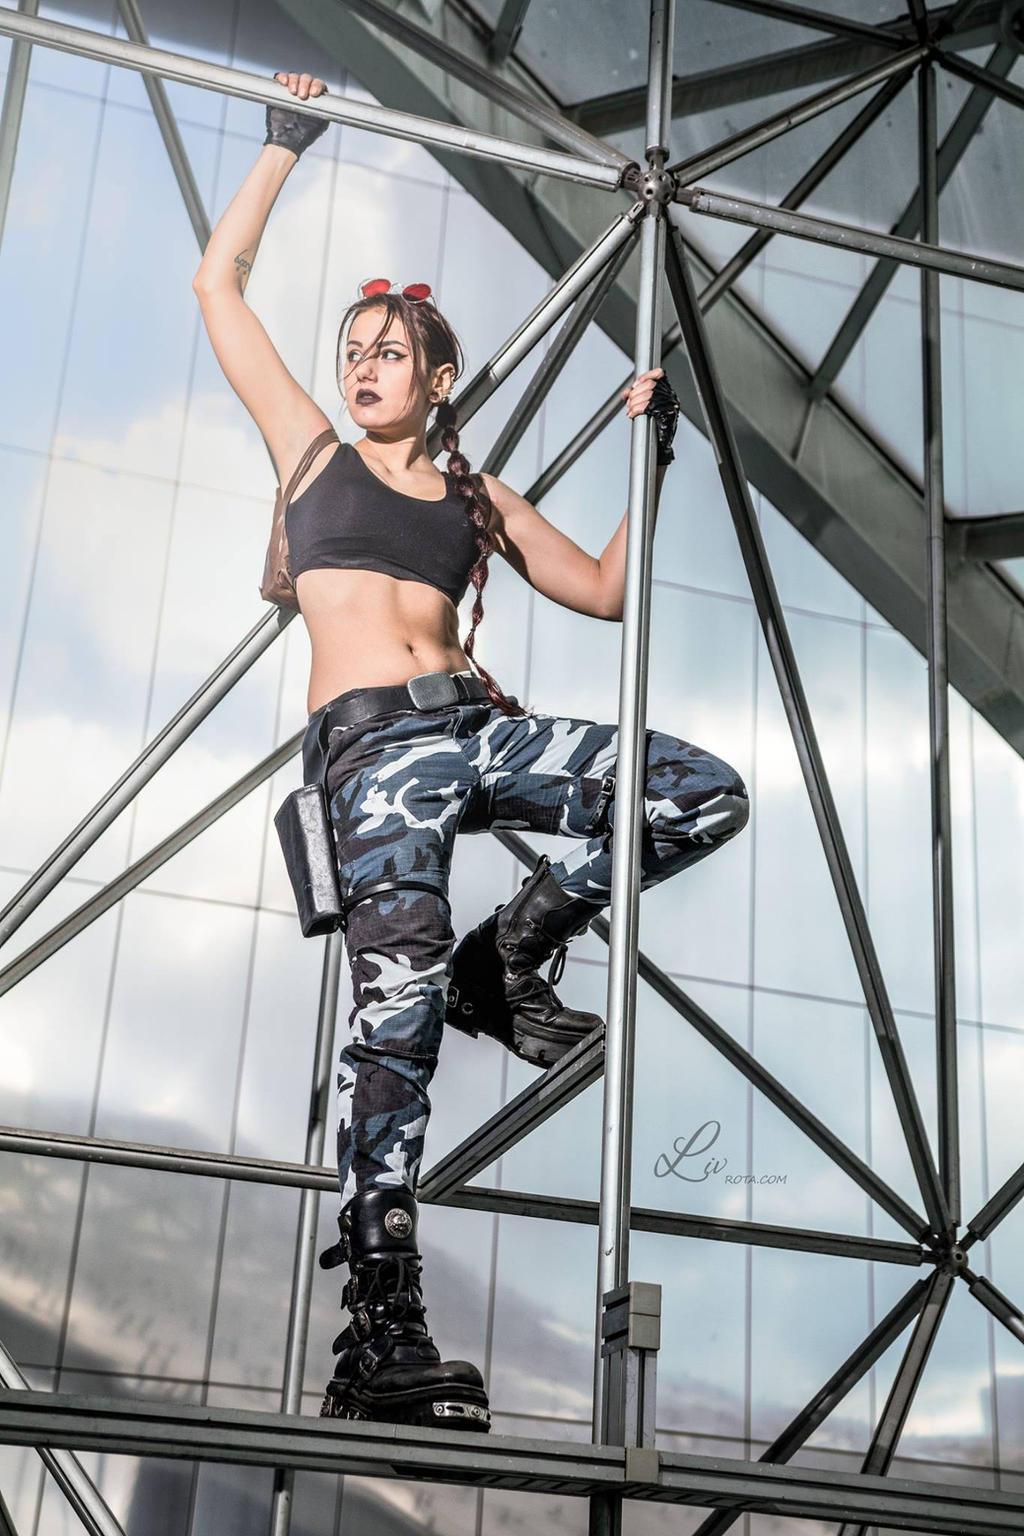 Tomb Raider III - High Security Compound by FuinurCroft